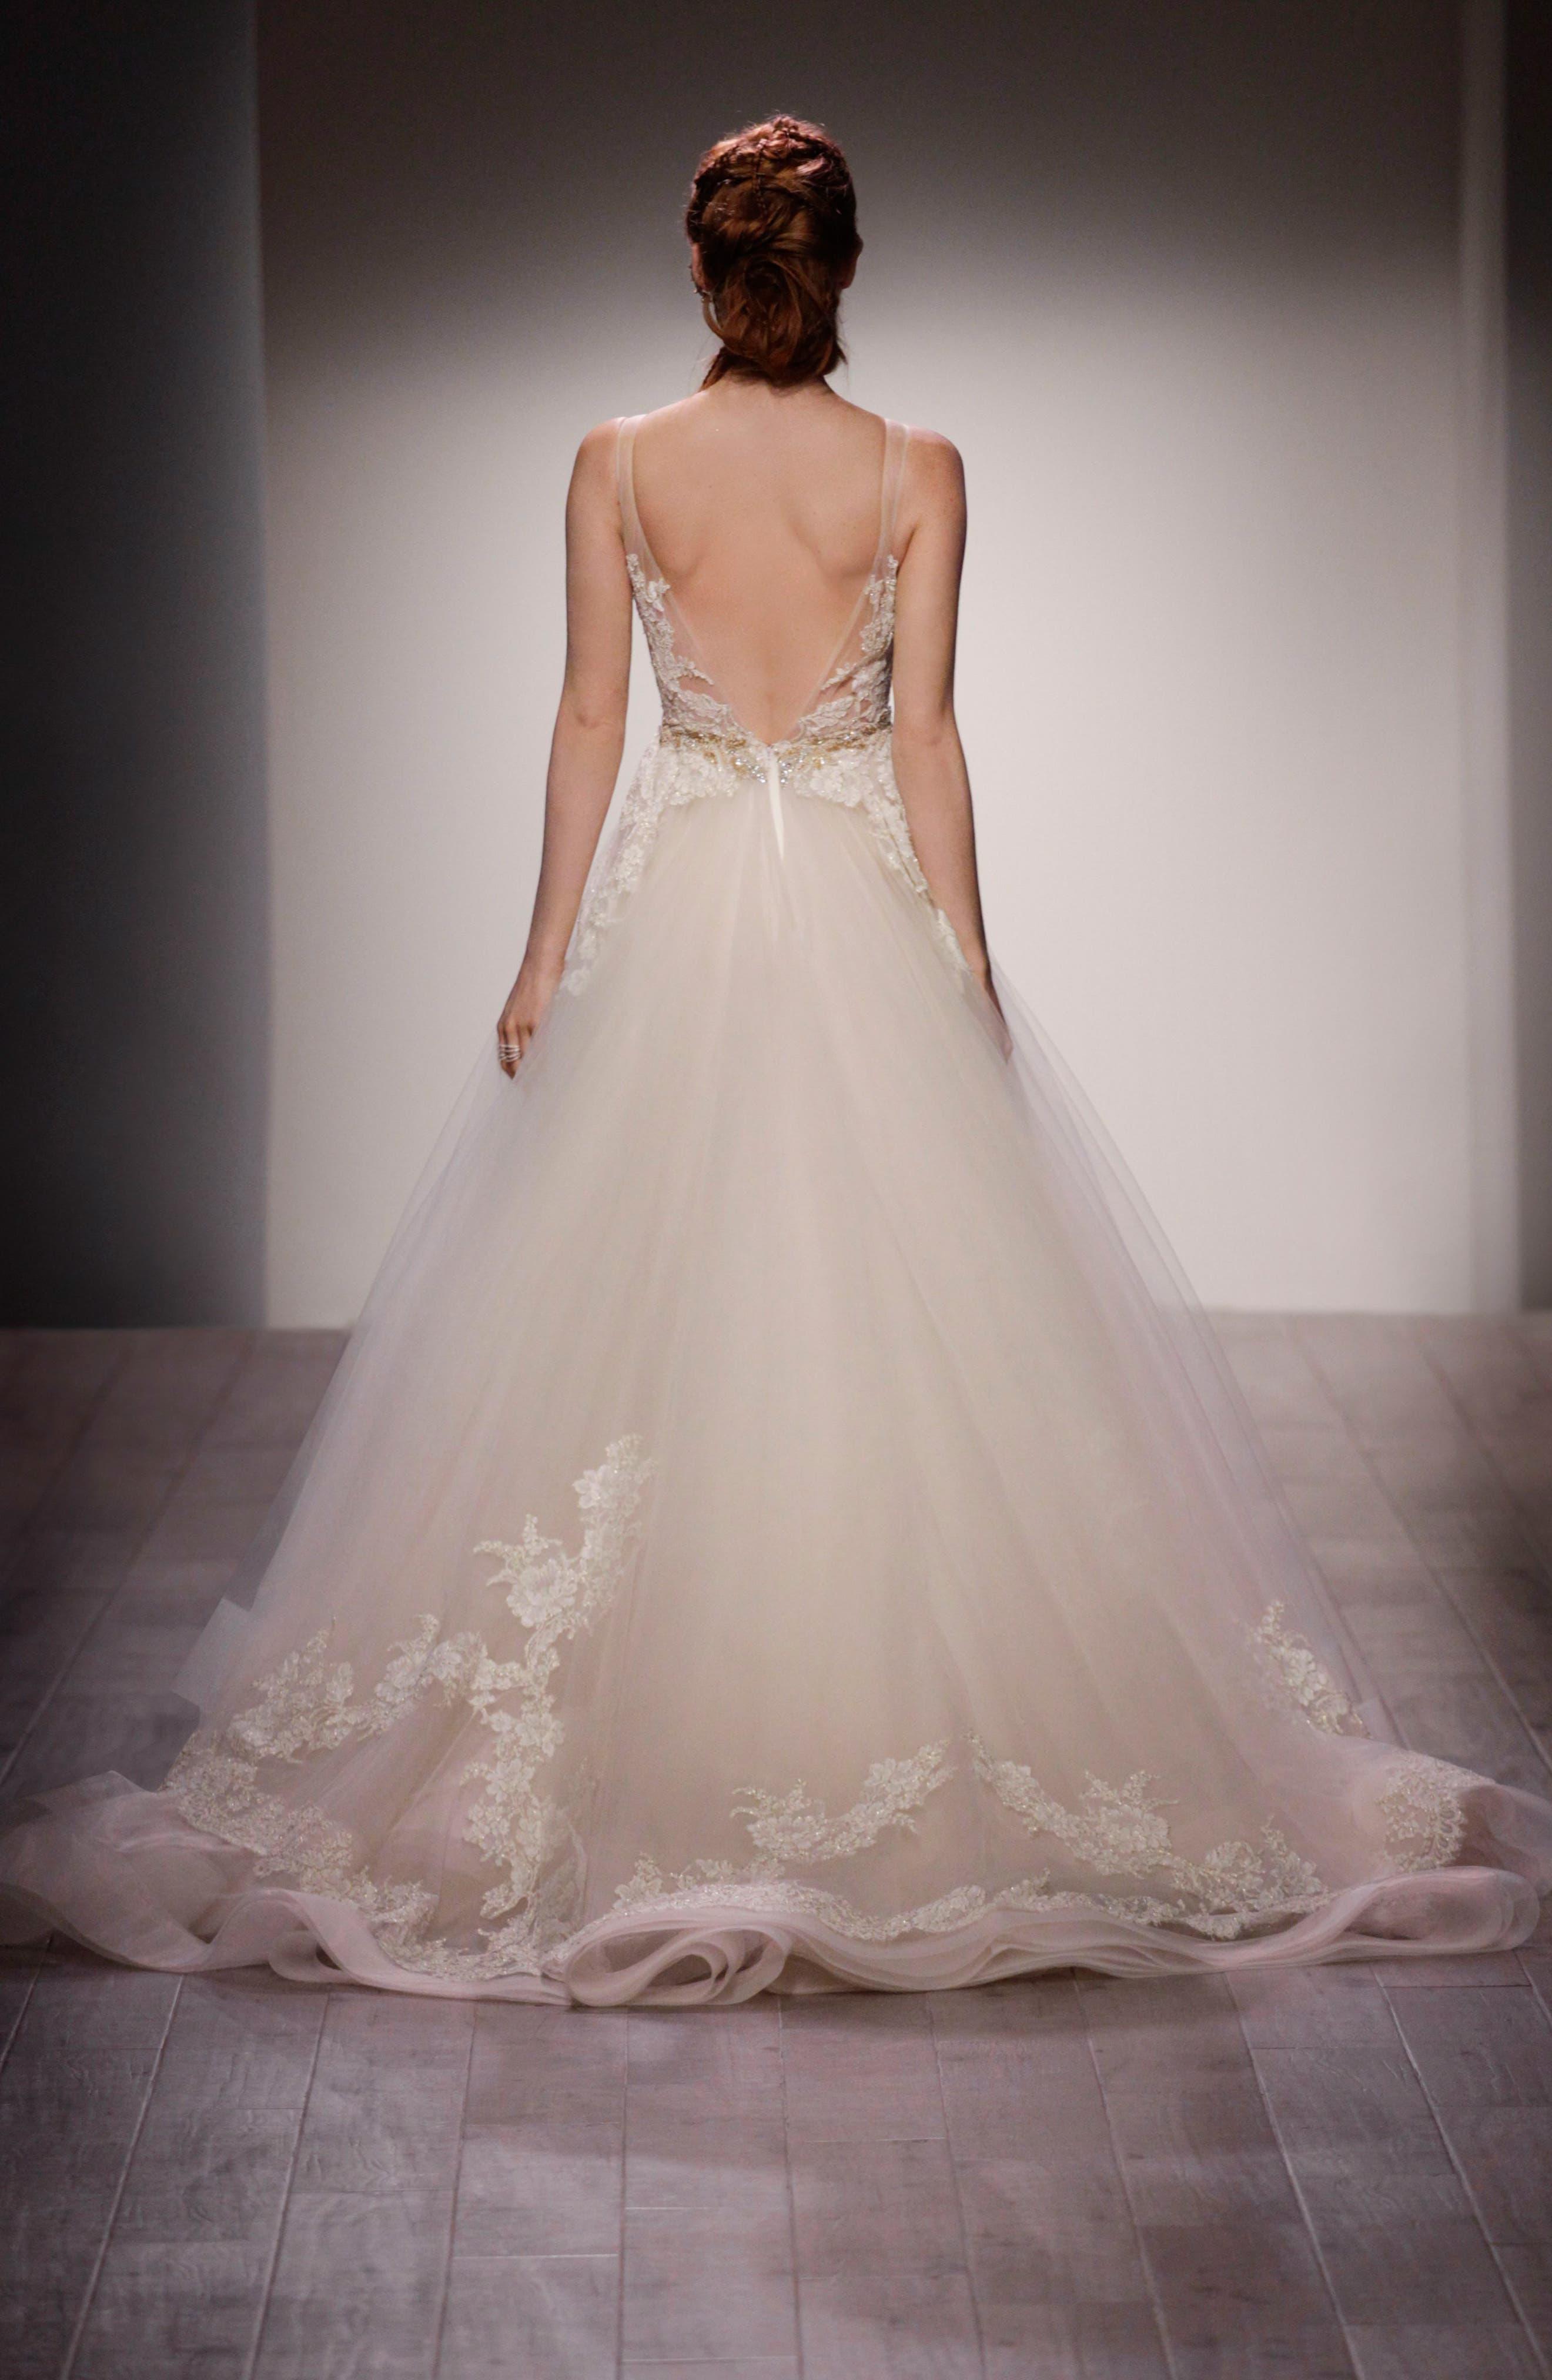 Lace Appliqué Tulle Ballgown Dress,                             Alternate thumbnail 4, color,                             IVORY/GOLD/CHAMPAGNE